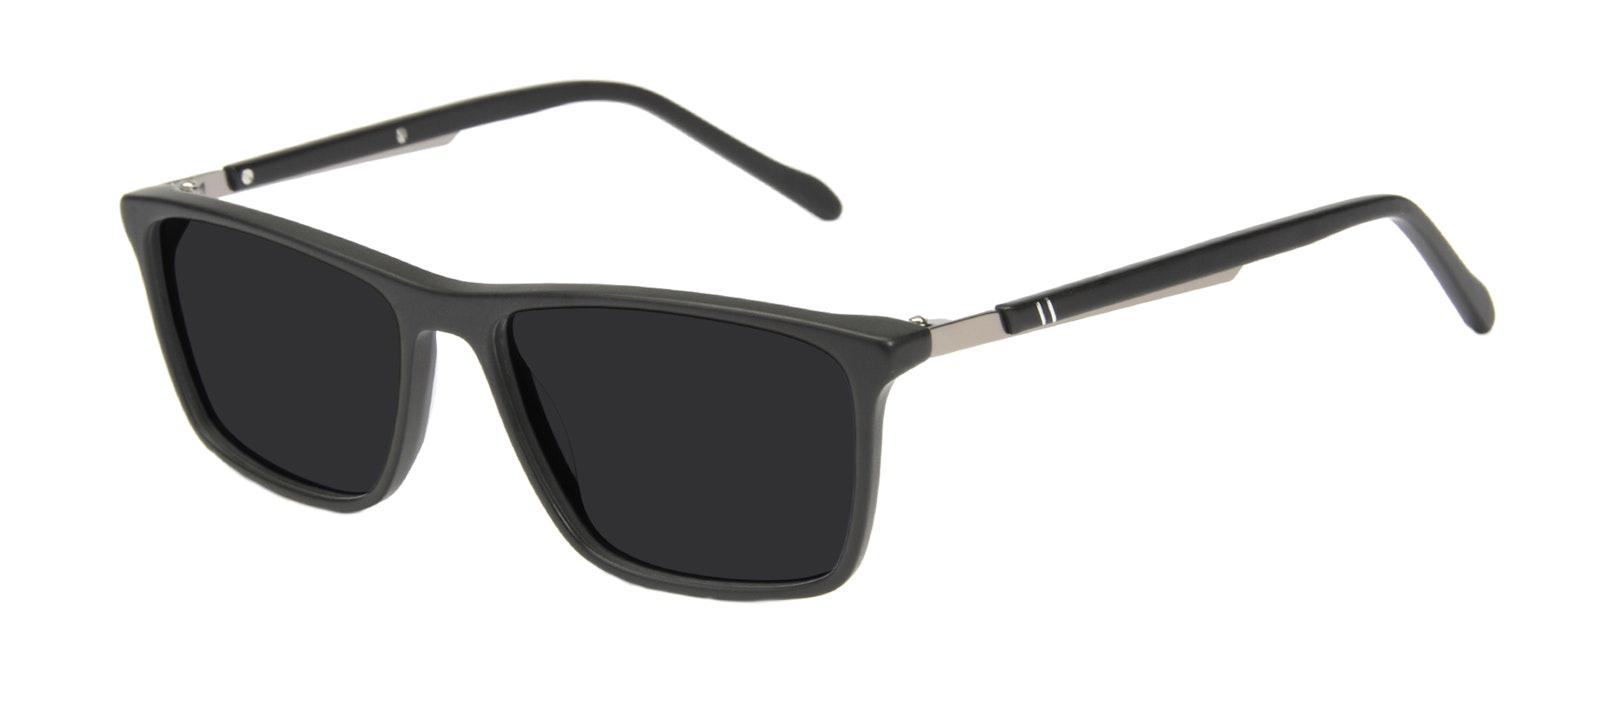 Affordable Fashion Glasses Rectangle Sunglasses Men Skill Matte Black Tilt